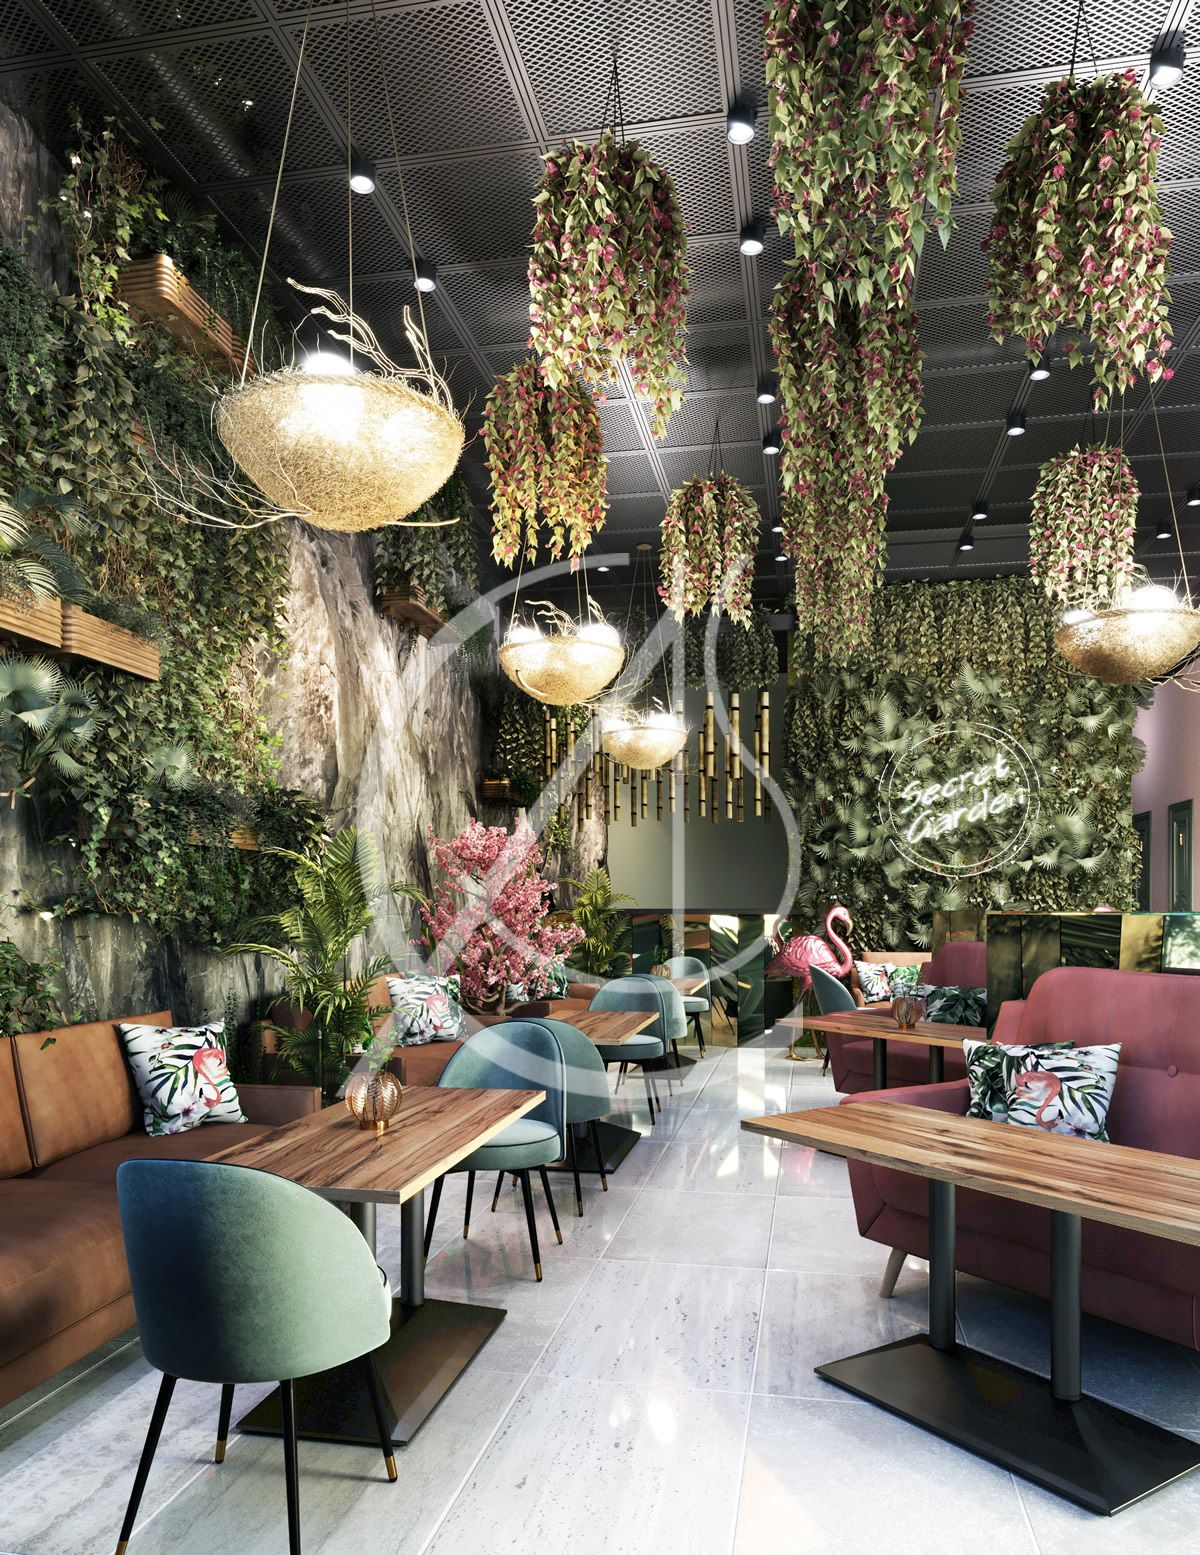 Secret Garden Theme Restaurant Design Khobar Saudi Araiba Cas In 2020 Secret Garden Theme Restaurant Design Modern Restaurant Design